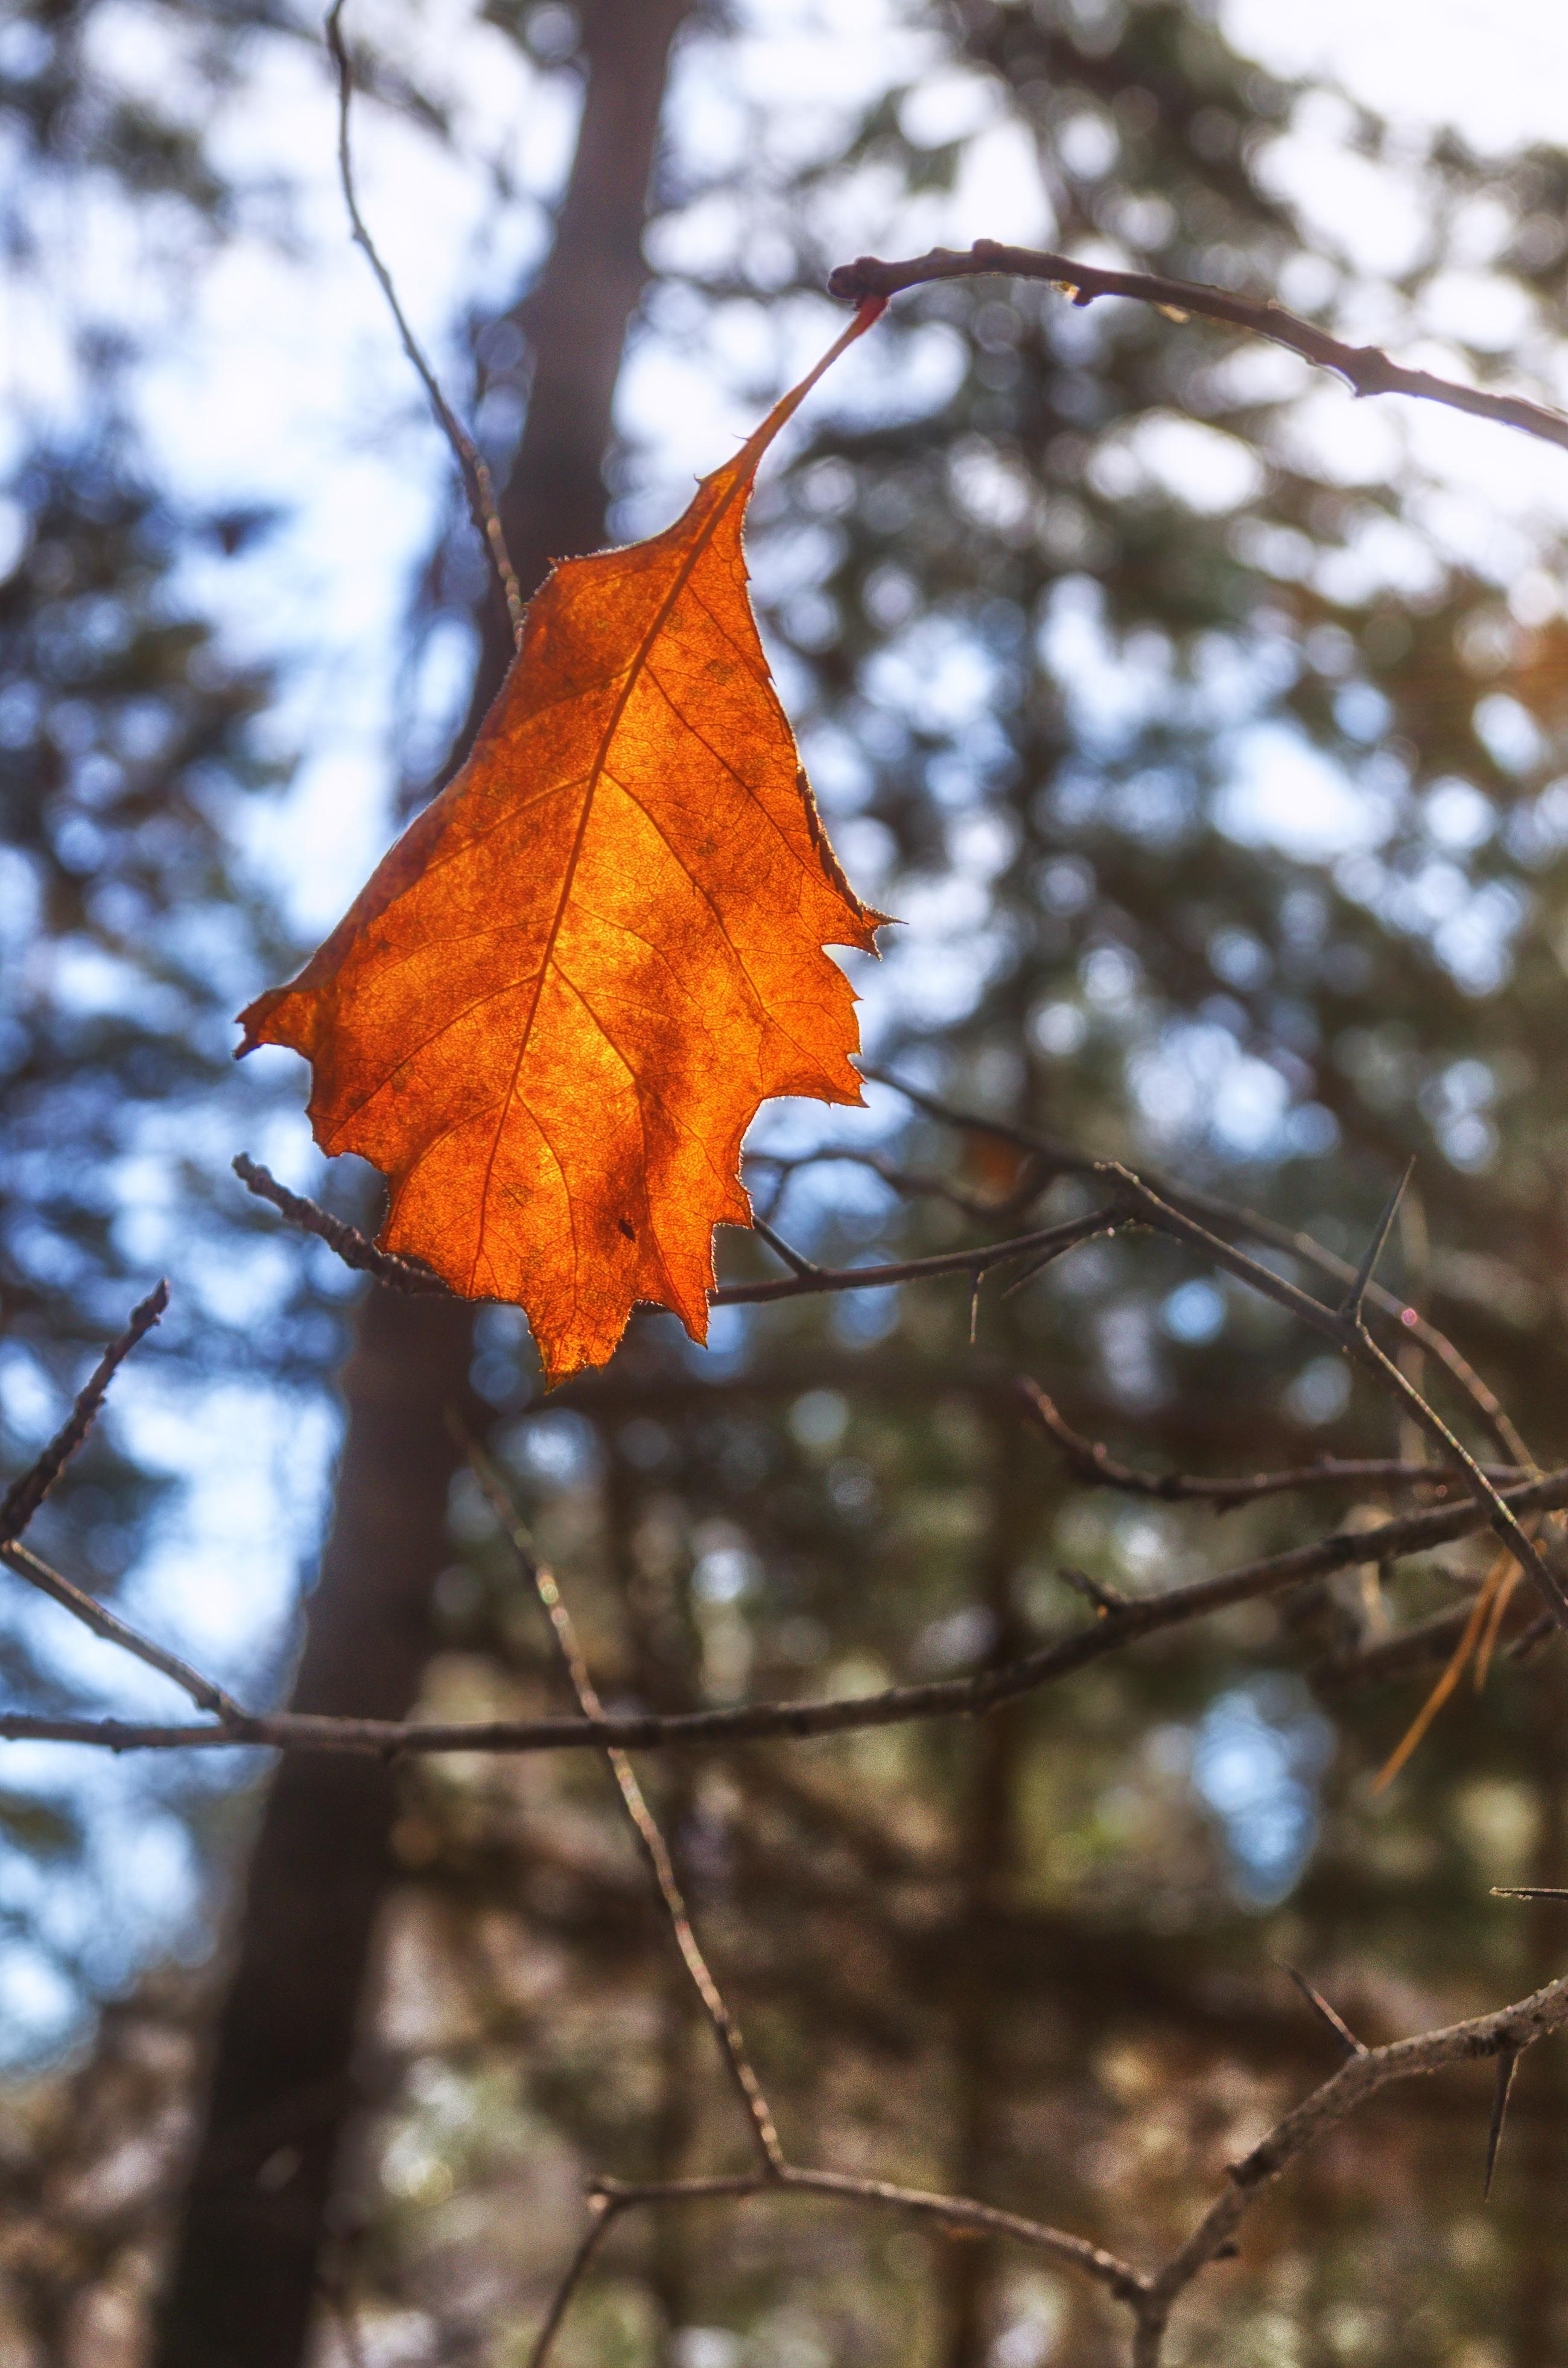 Fotos gratis : árbol, naturaleza, rama, invierno, luz de sol, flor ...